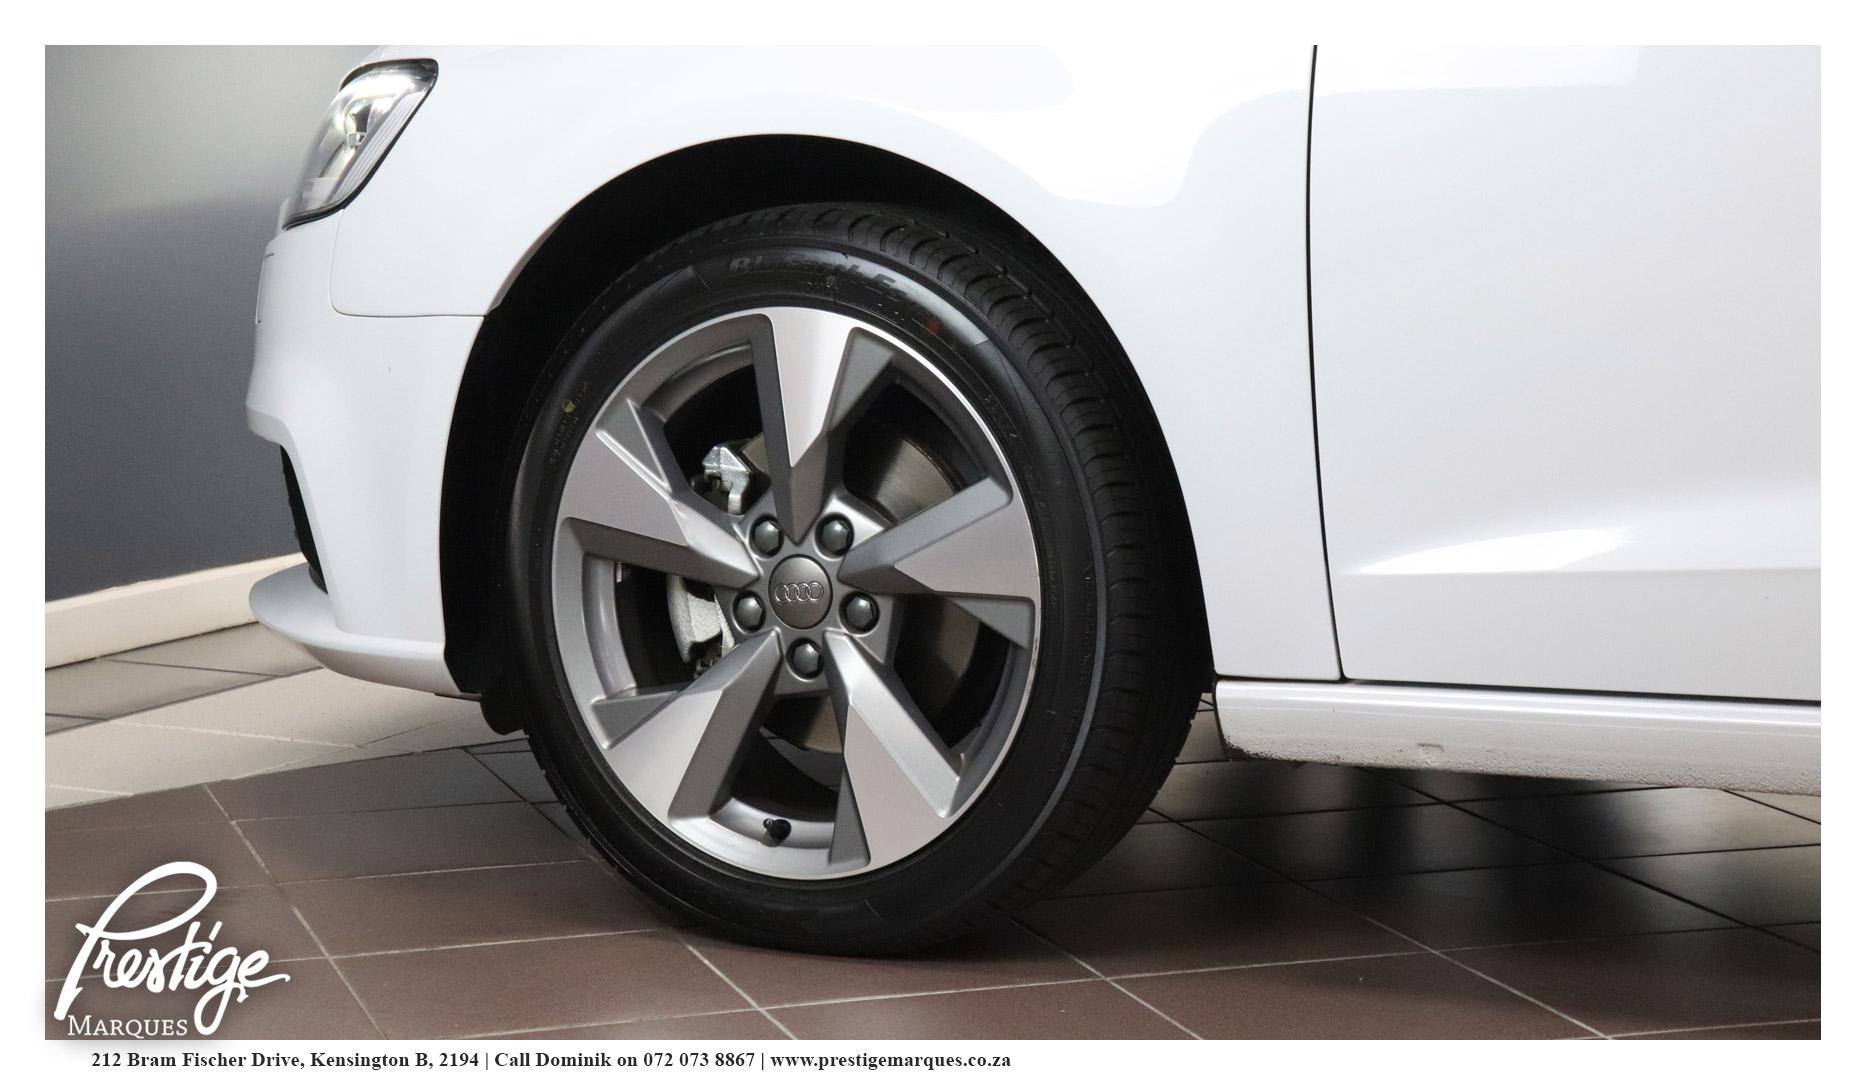 2017-Audi-A3-Sportback-1-4-TFSi-Stronic-Prestige-Marques-Randburg-Sandton-11